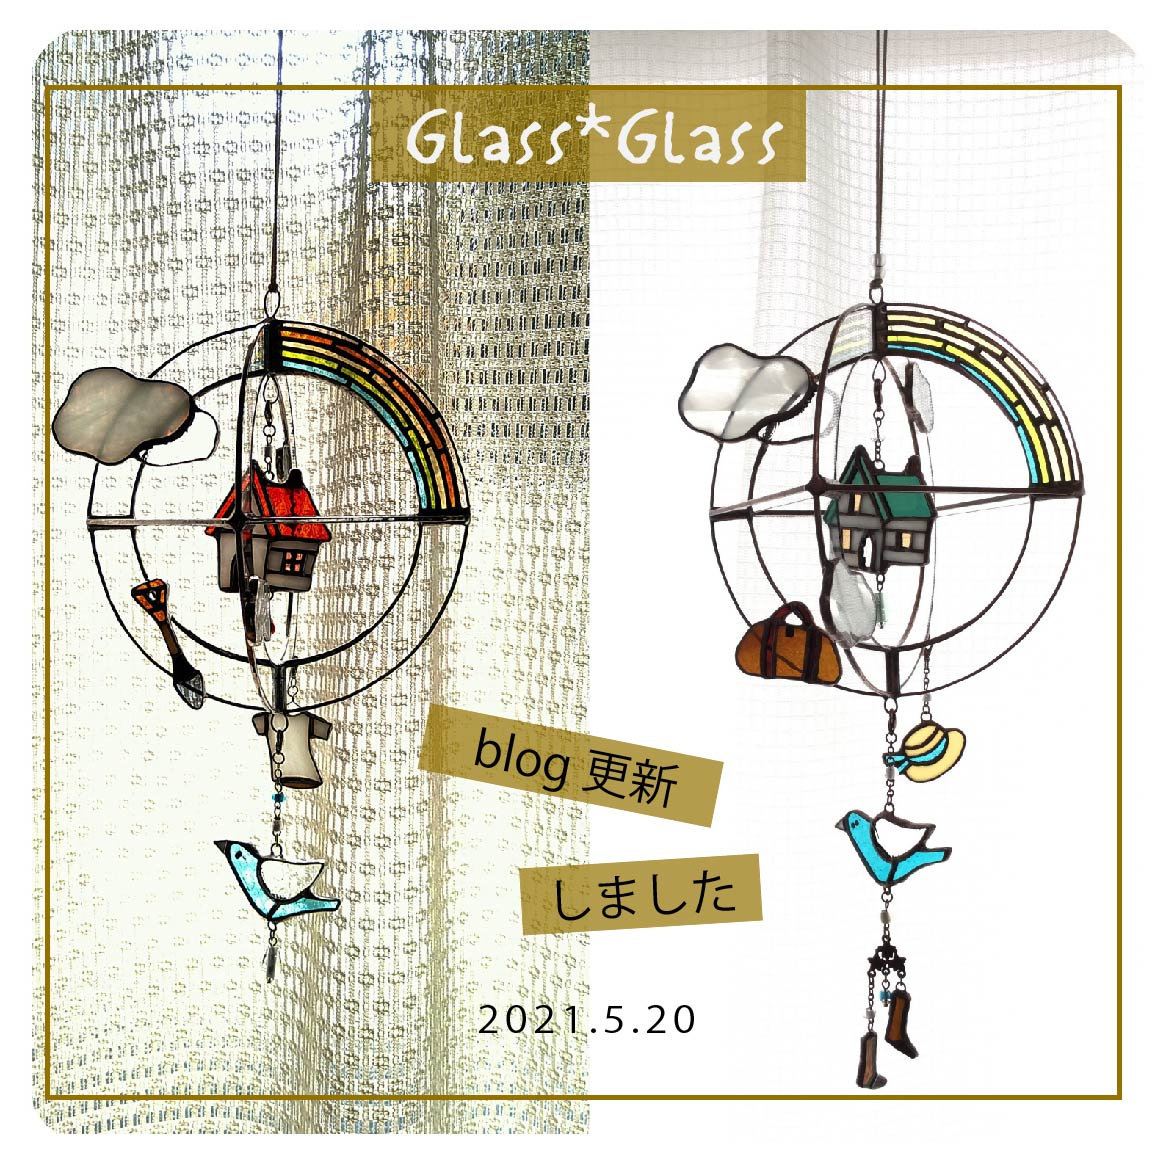 f:id:glassglassmegu:20210520143413j:plain